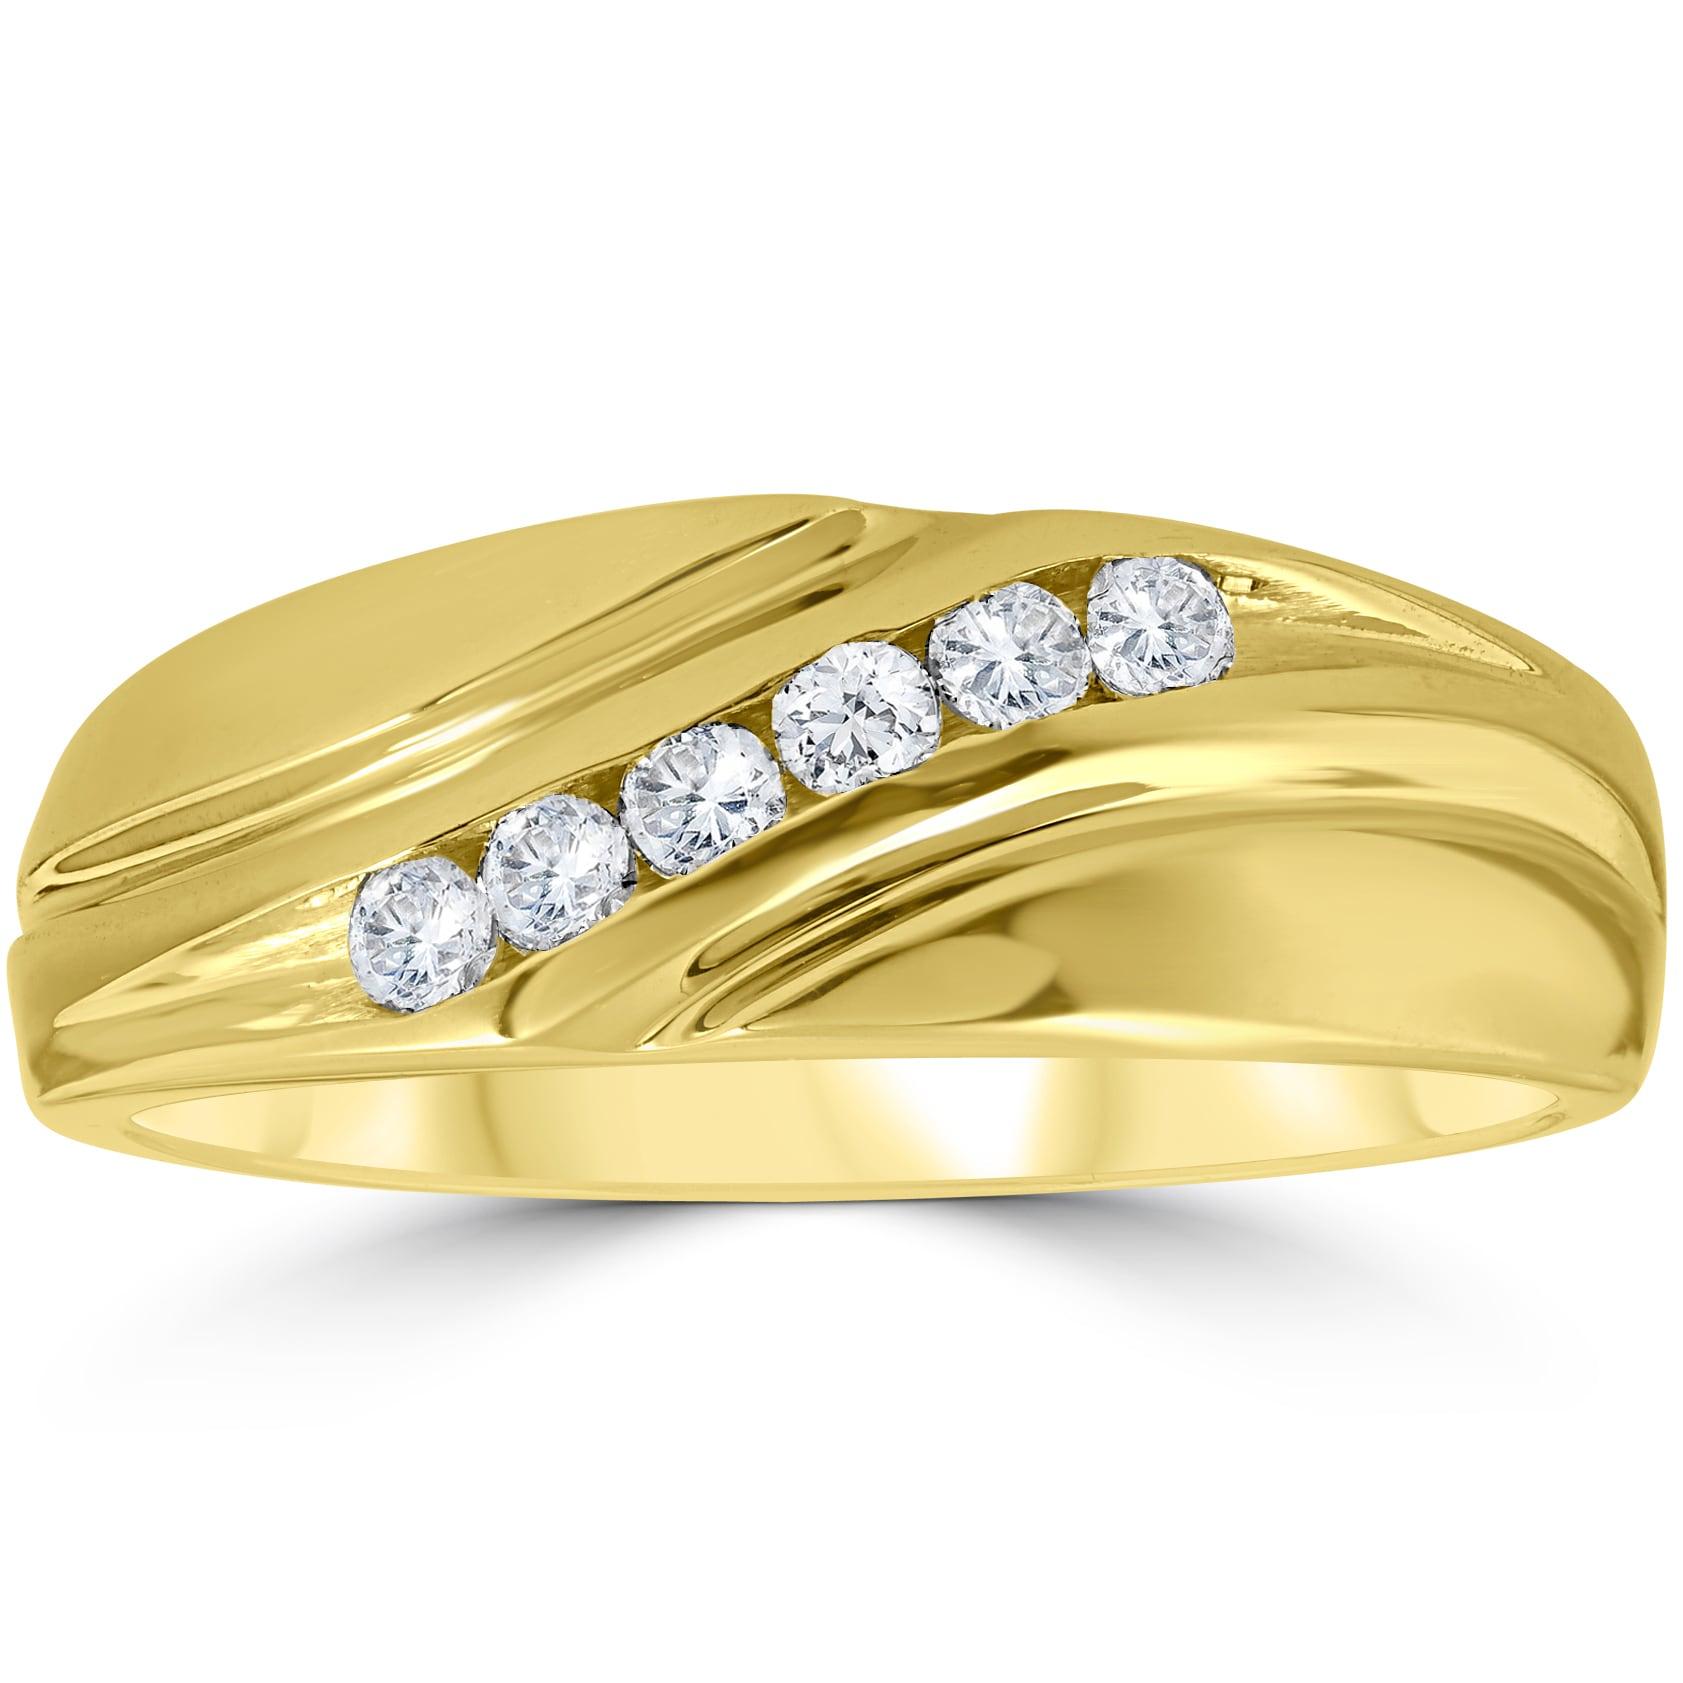 Buy Over 10 Mm Men's Wedding Bands Groom Rings Online At Overstock Our Best Deals: 20mm Cross Wedding Bands At Websimilar.org